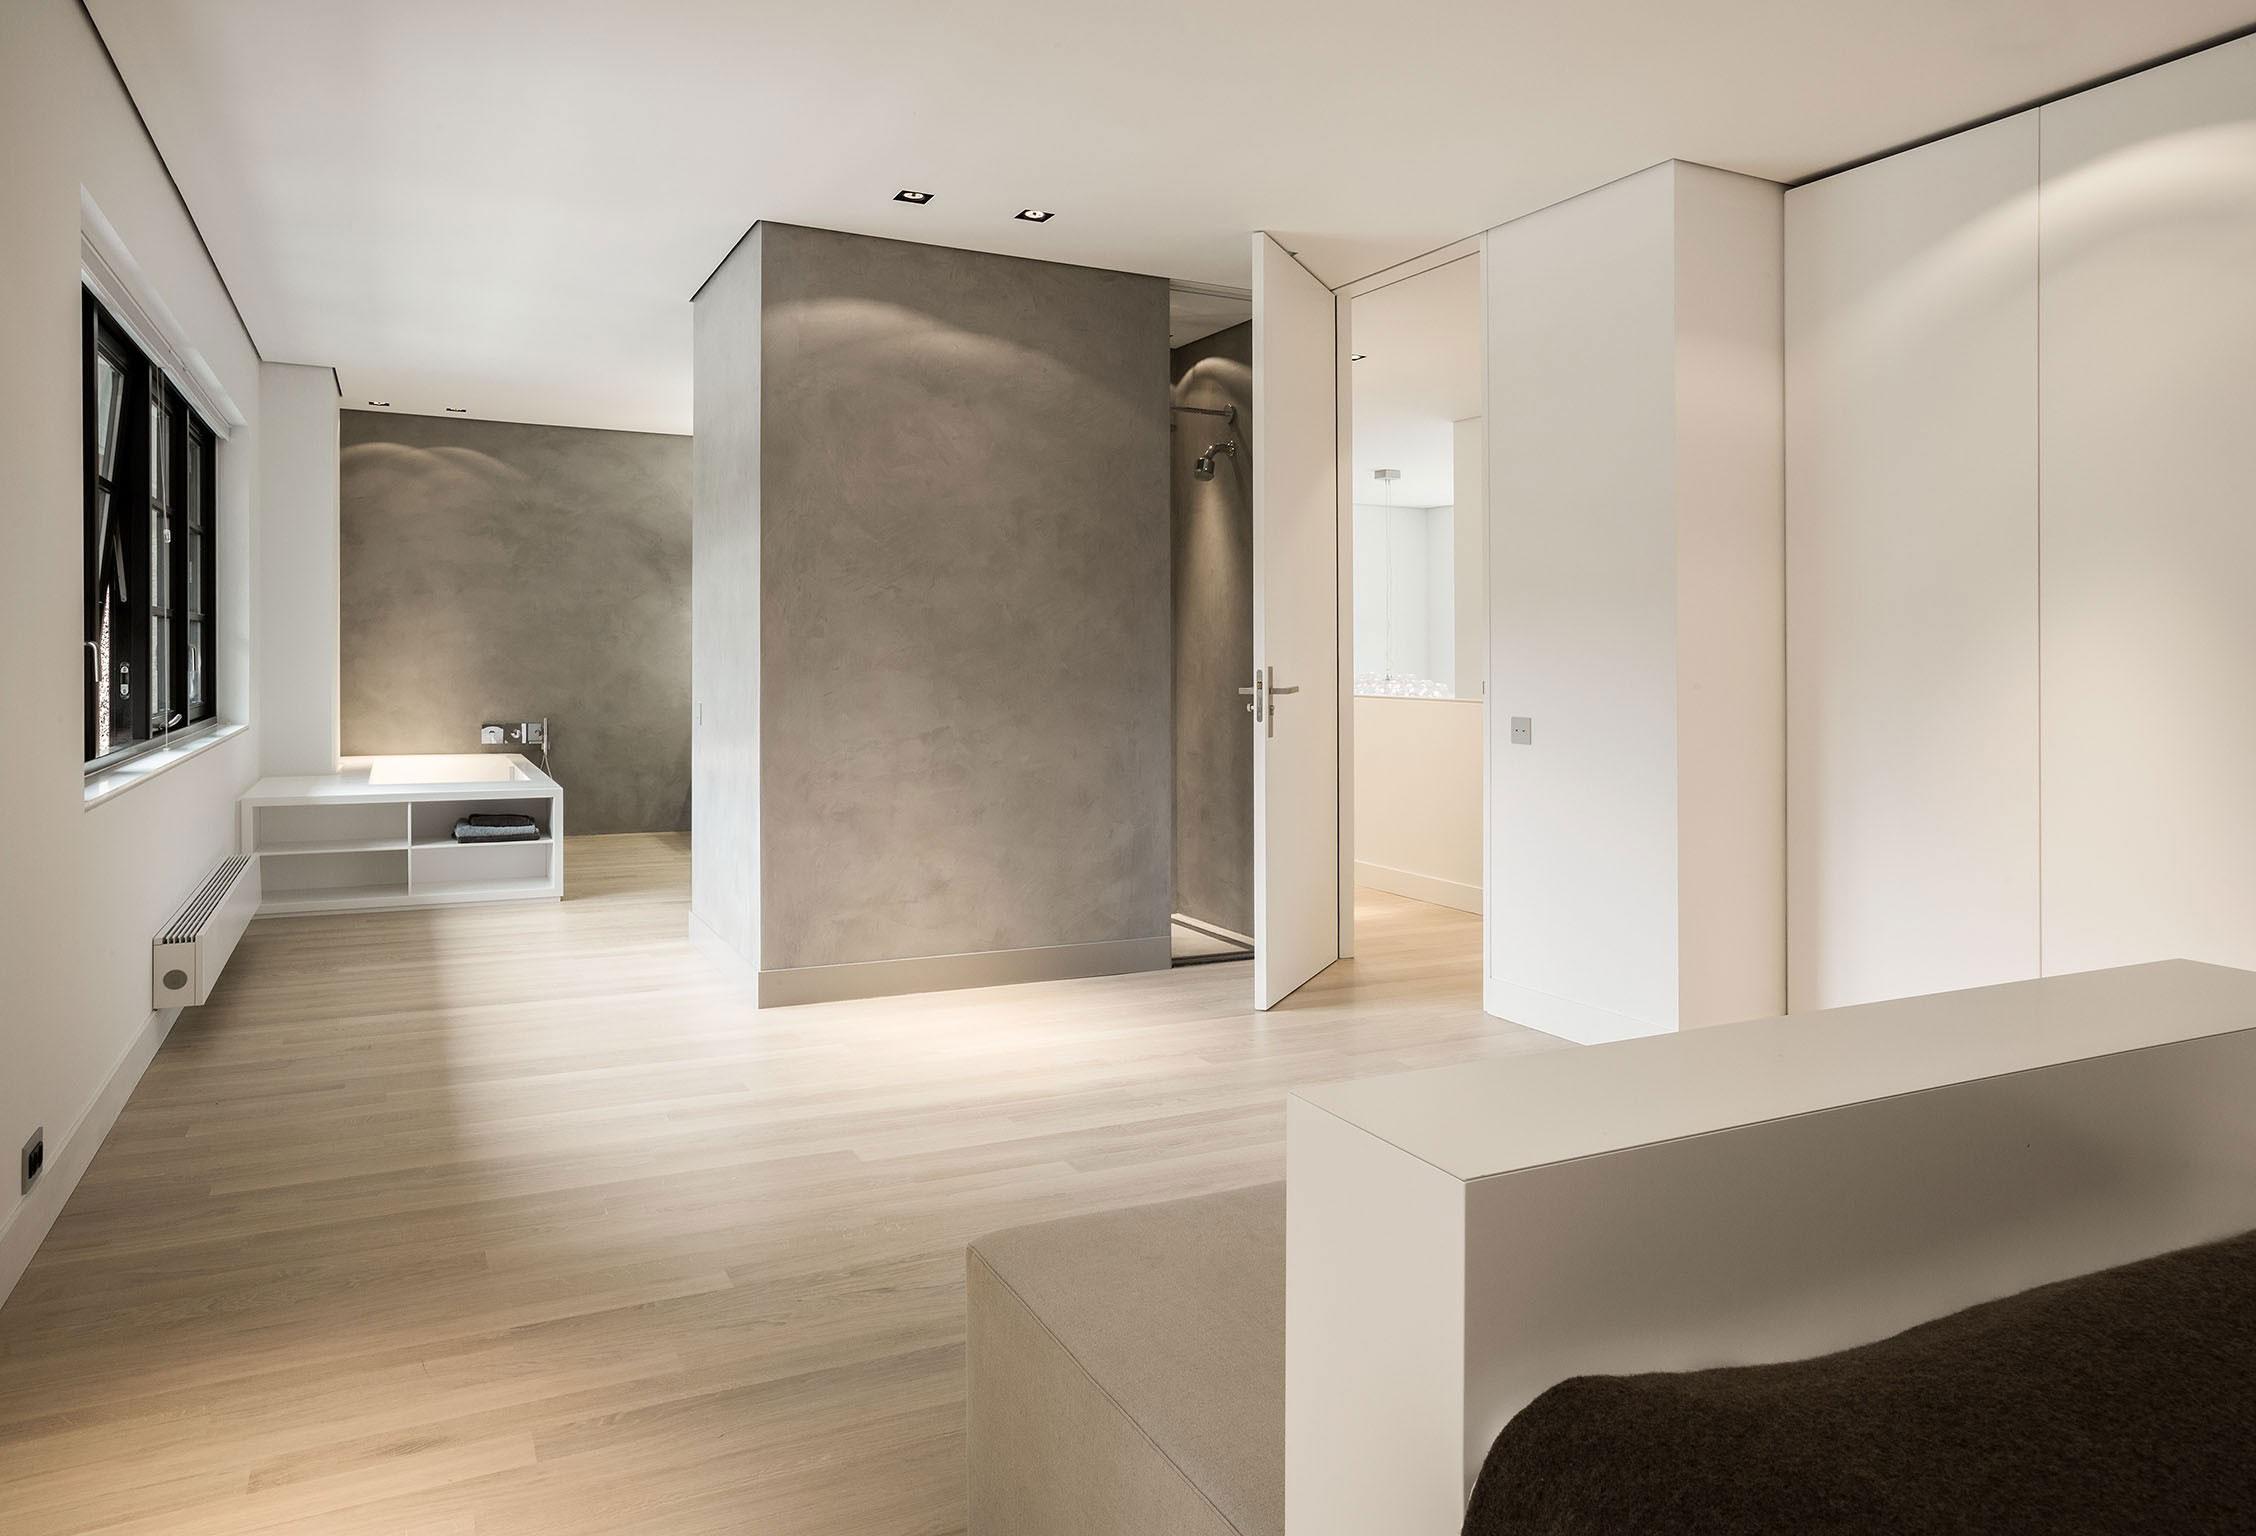 Modern Huizen Country House Located in a Quiet Rural Setting by De Brouwer Binnenwerk-17